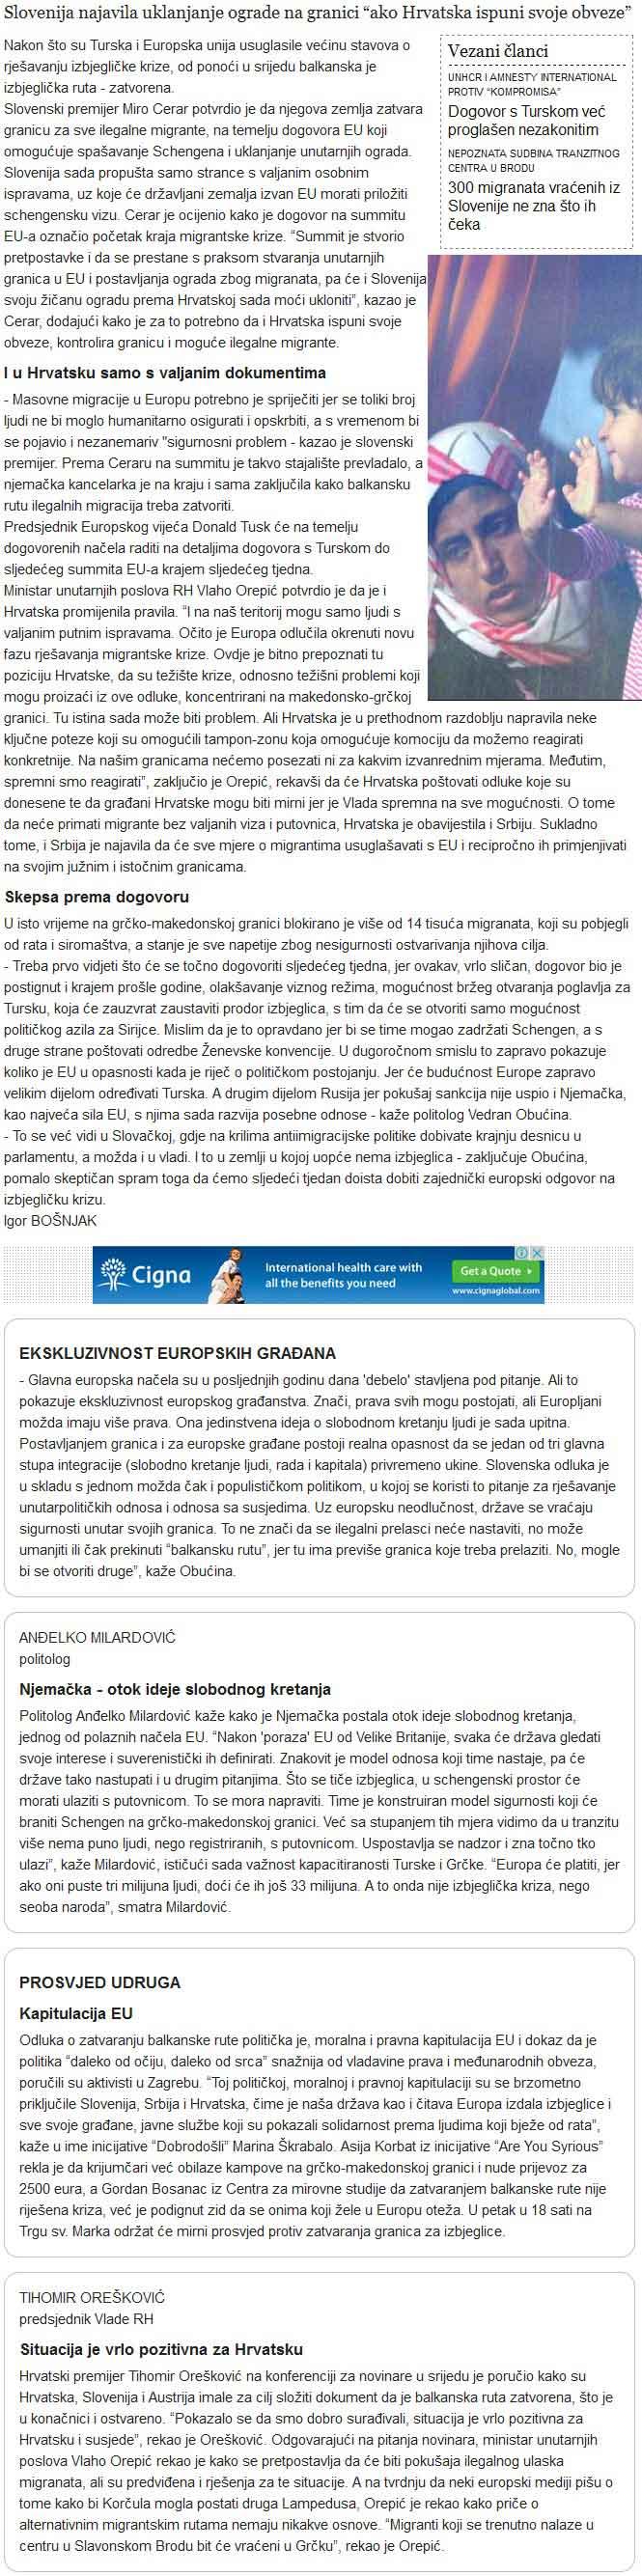 screenshot-www-glas-slavonije-hr-2016-03-10-05-49-26